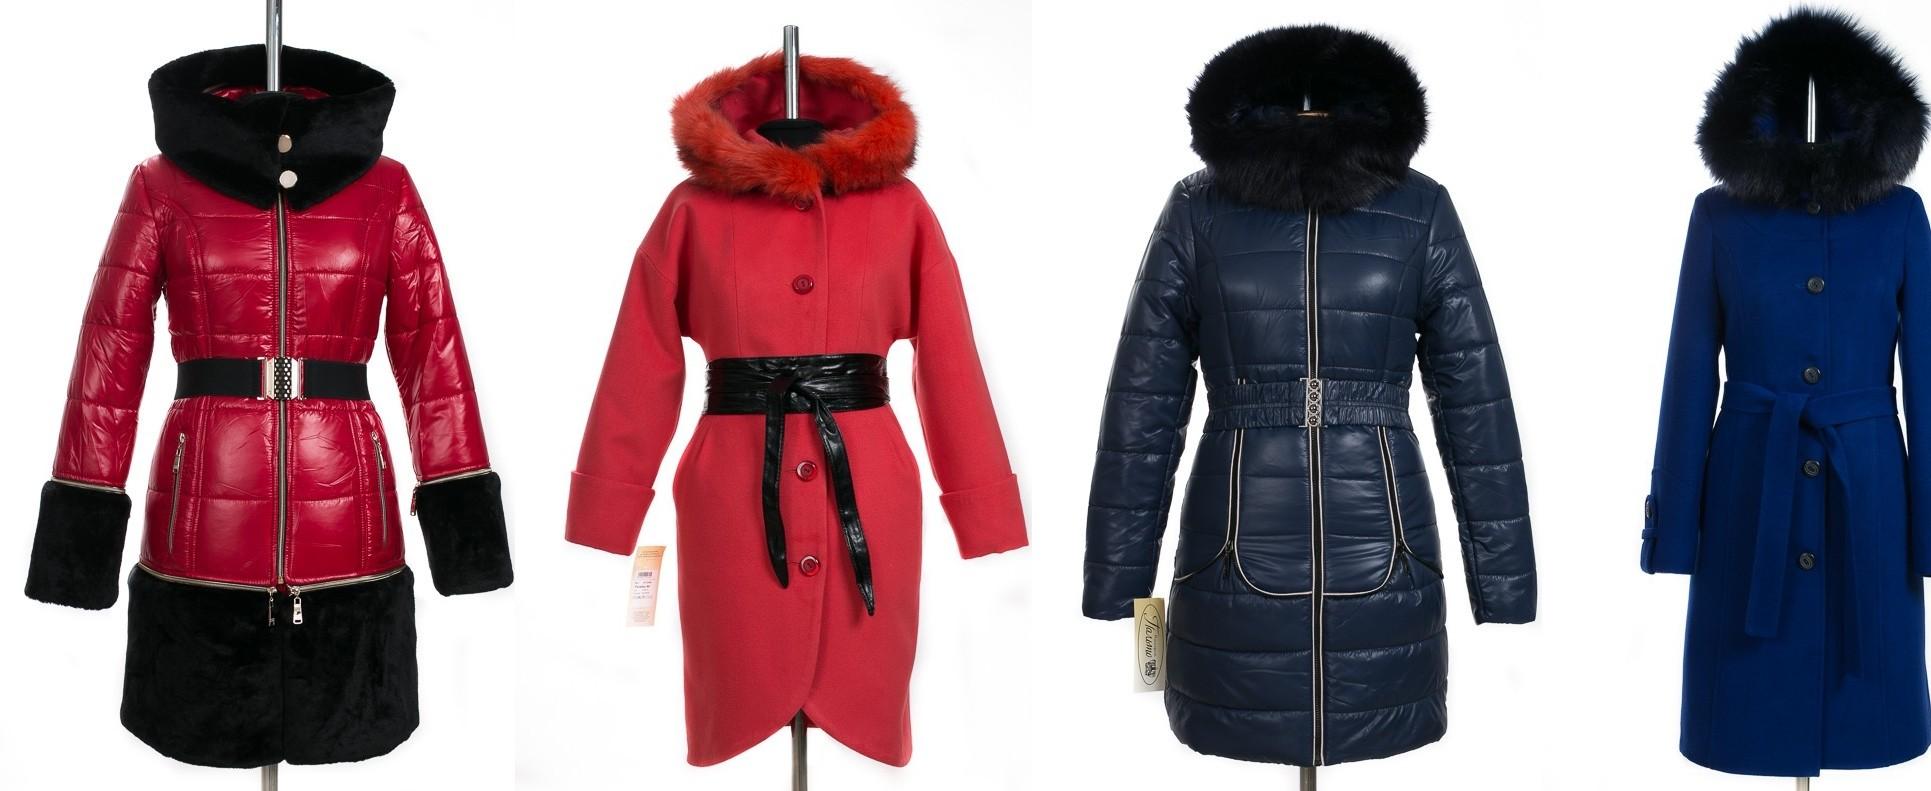 Пальто Фабрики T a n i - 3